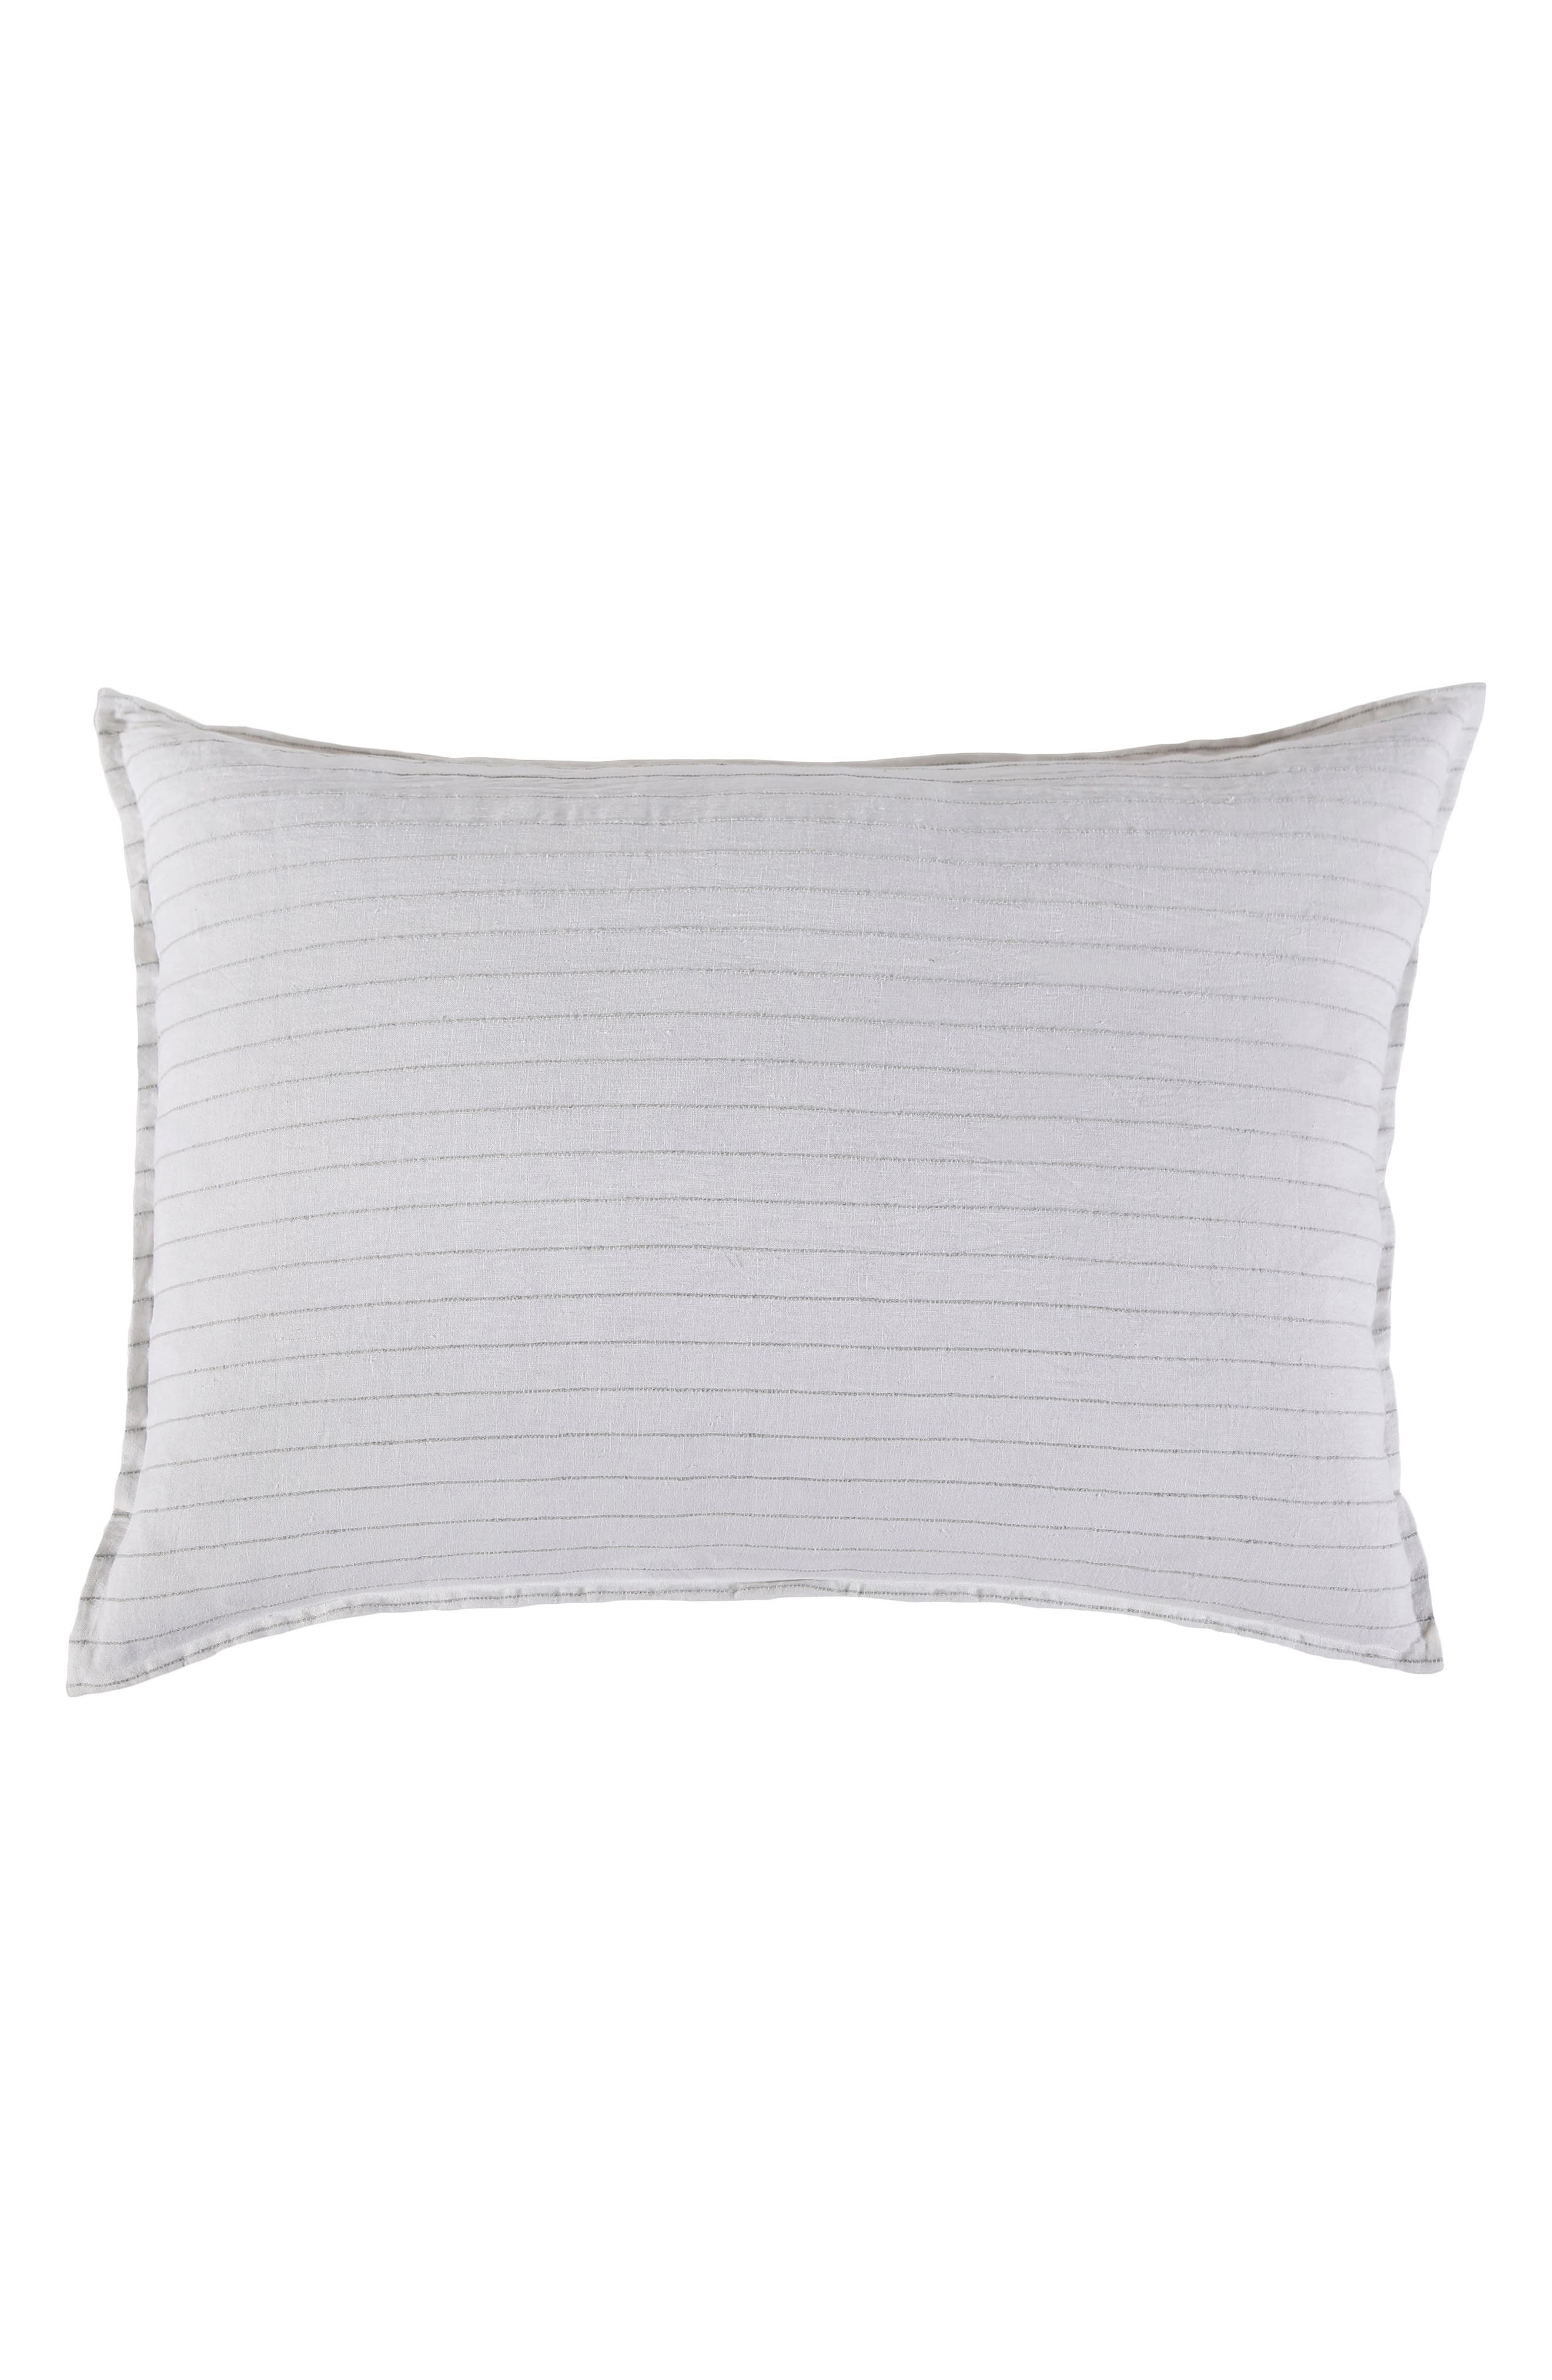 POM POM AT HOME, Blake Big Linen Accent Pillow, Main thumbnail 1, color, WHITE/ OCEAN